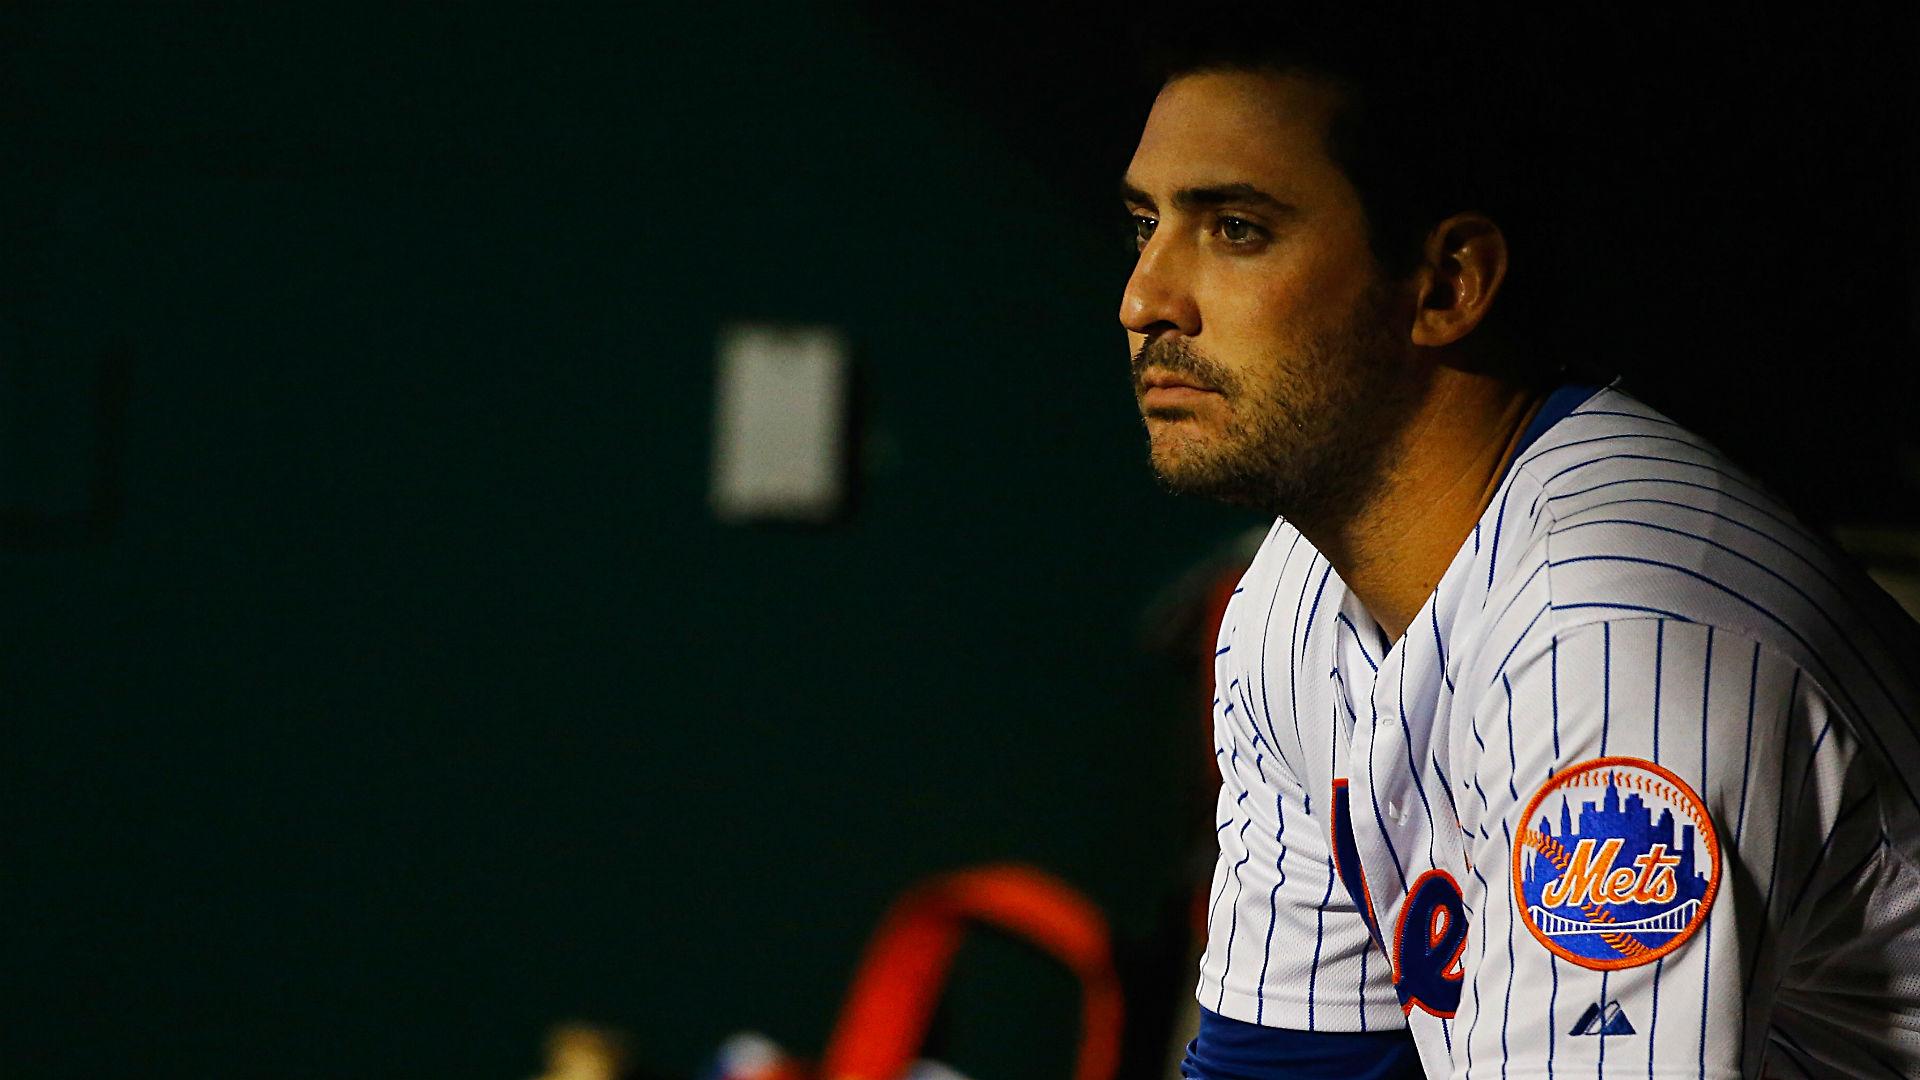 Mets ace Matt Harvey brings electricity back to Queens ...